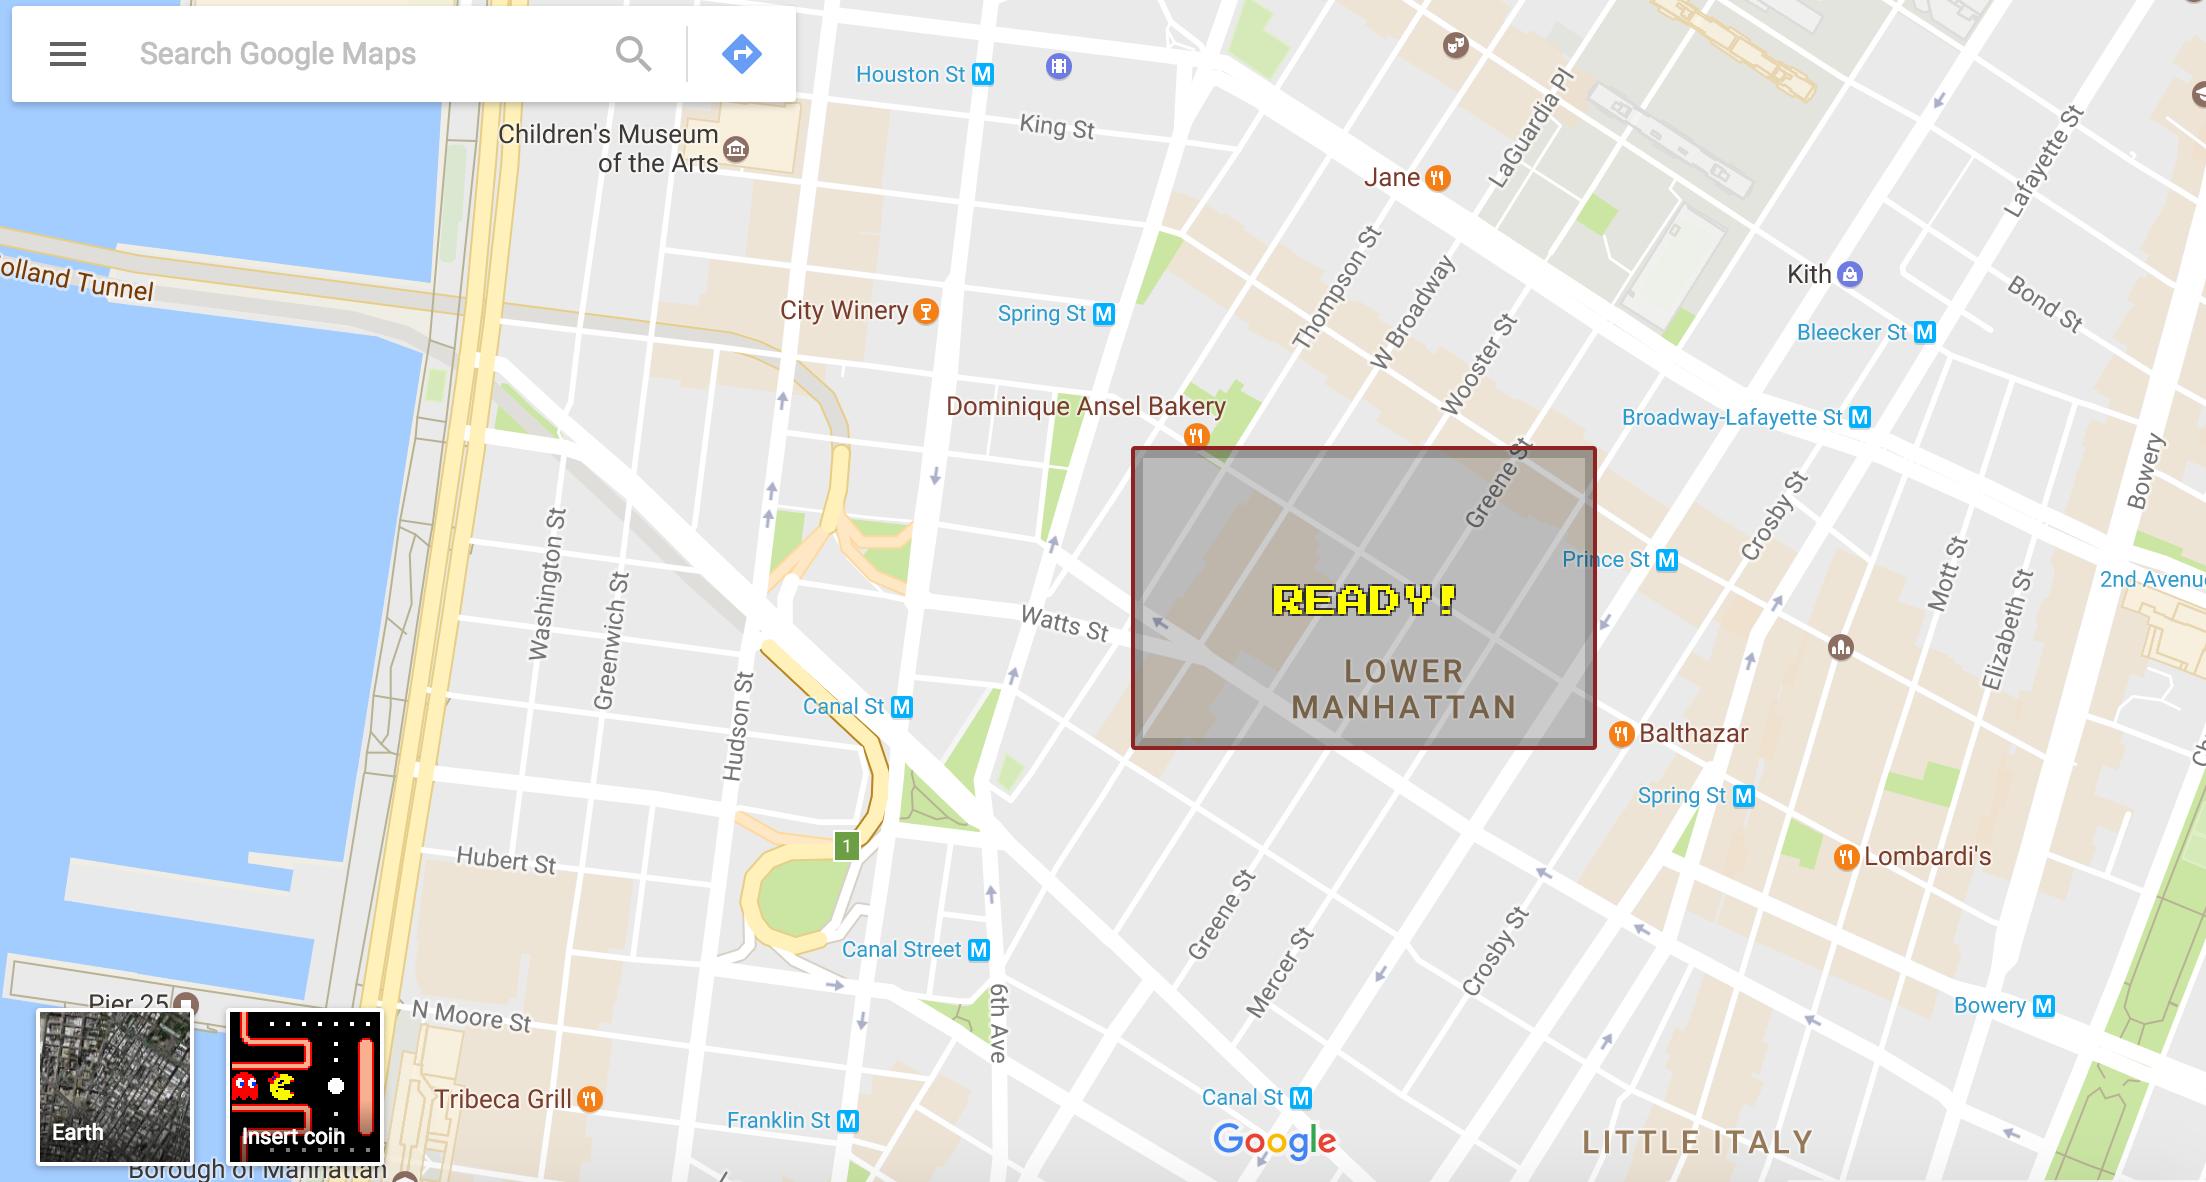 Google Map Usa Ca Google Images Google Maps United States - Google maps us map